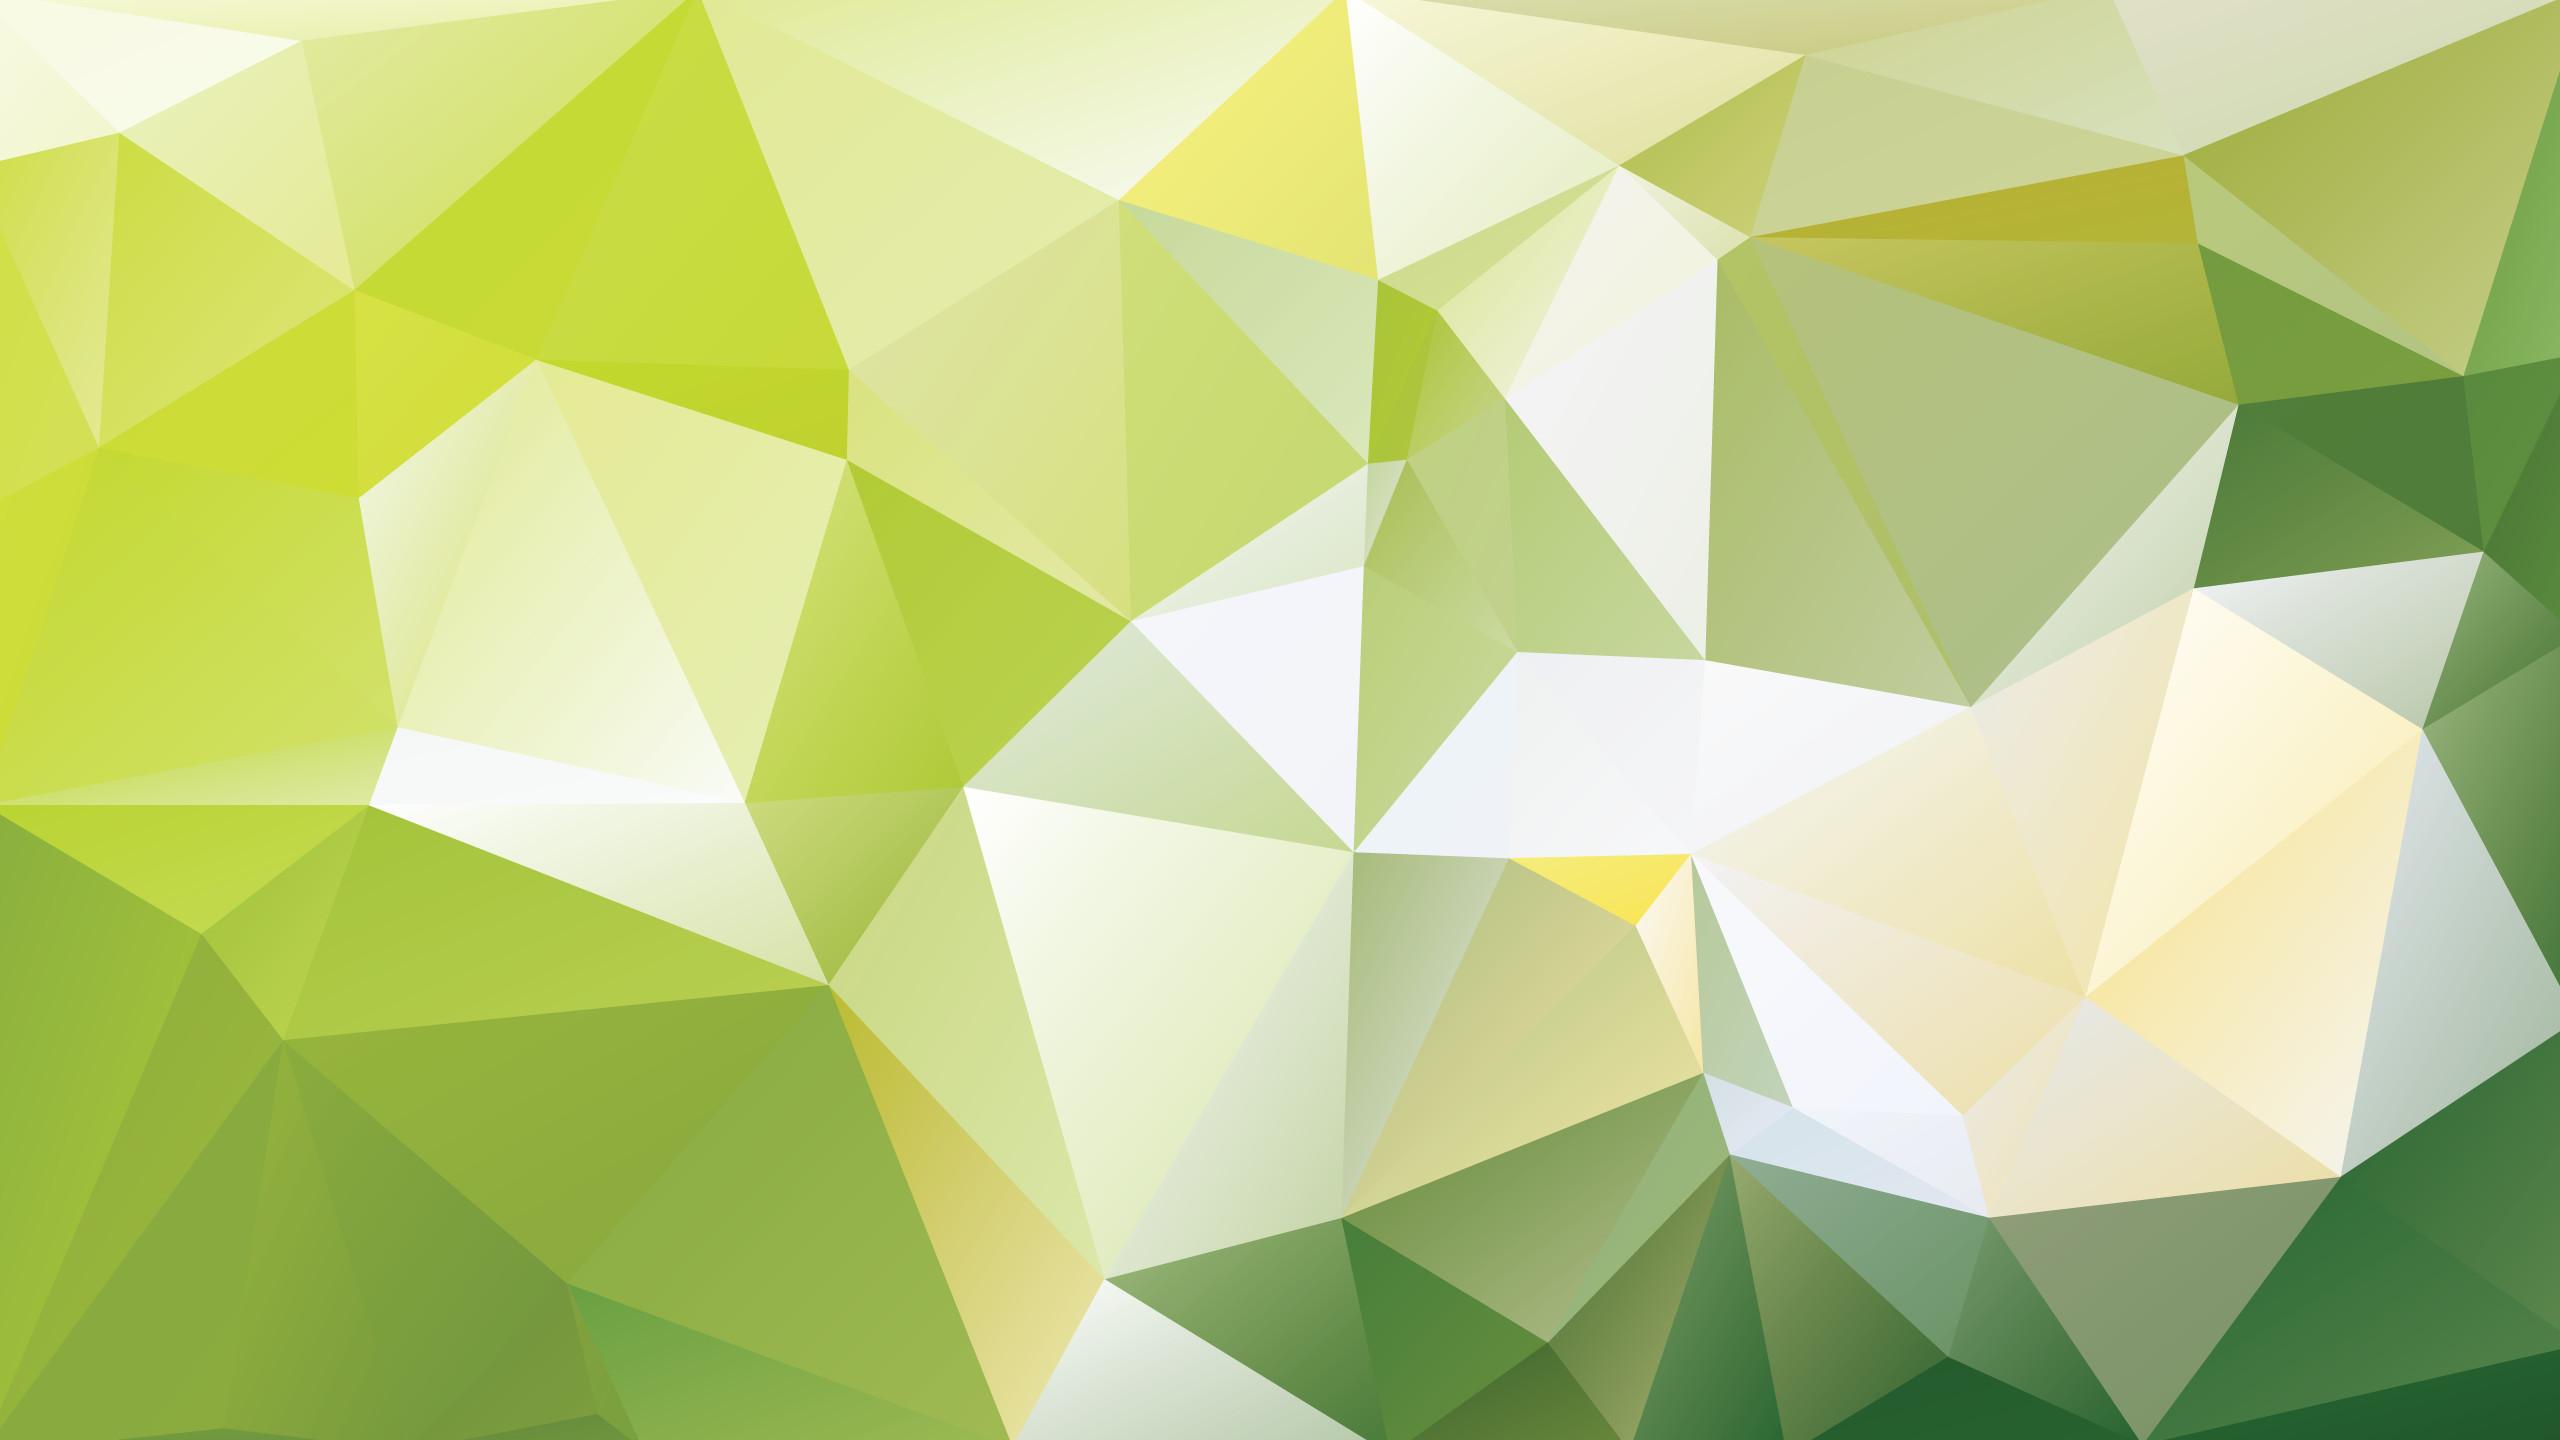 Free Colorful Geometric Wallpaper: Geometric Animal Wallpaper (74+ Images